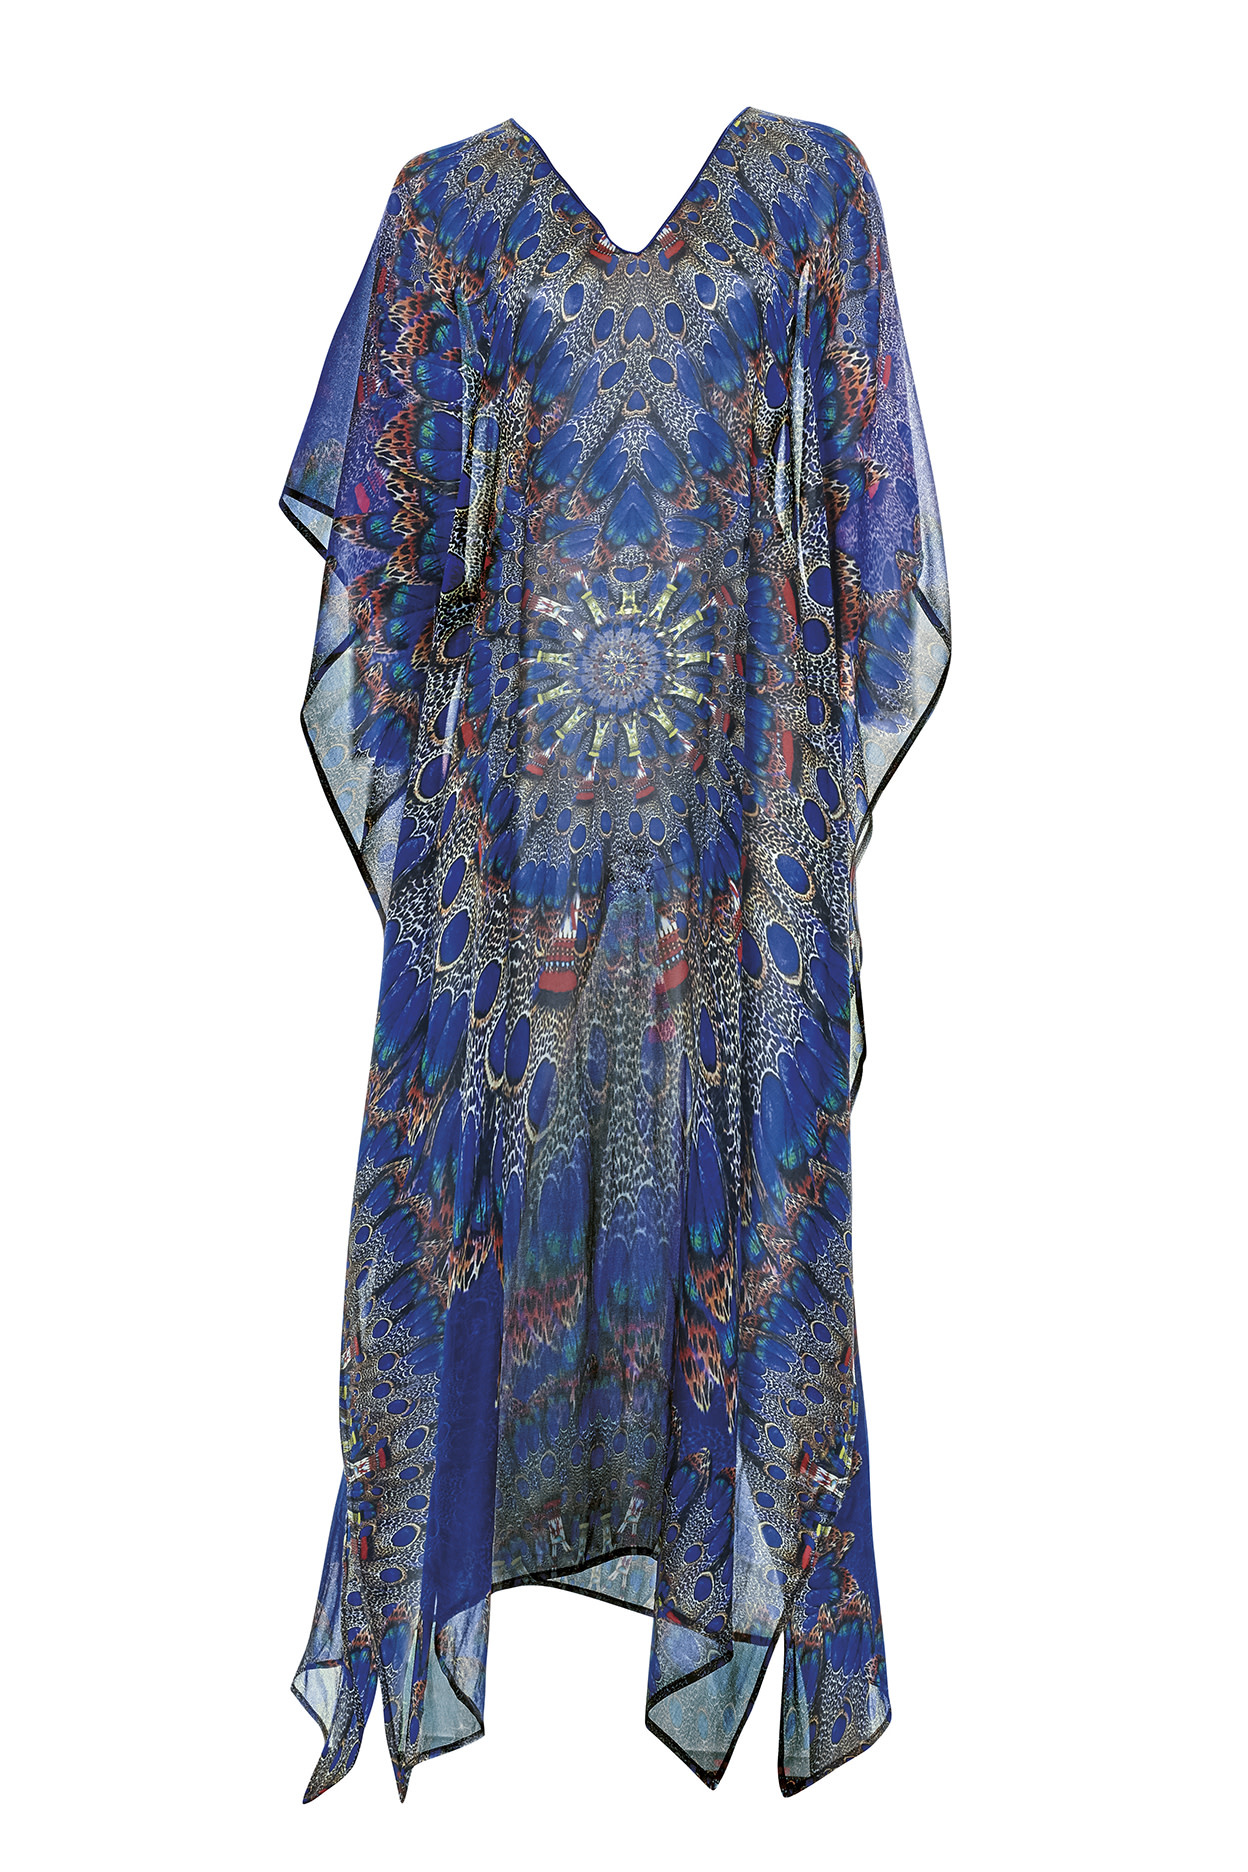 Alya Gold Embellished Off White Wedding Kaftan Maxi Gown